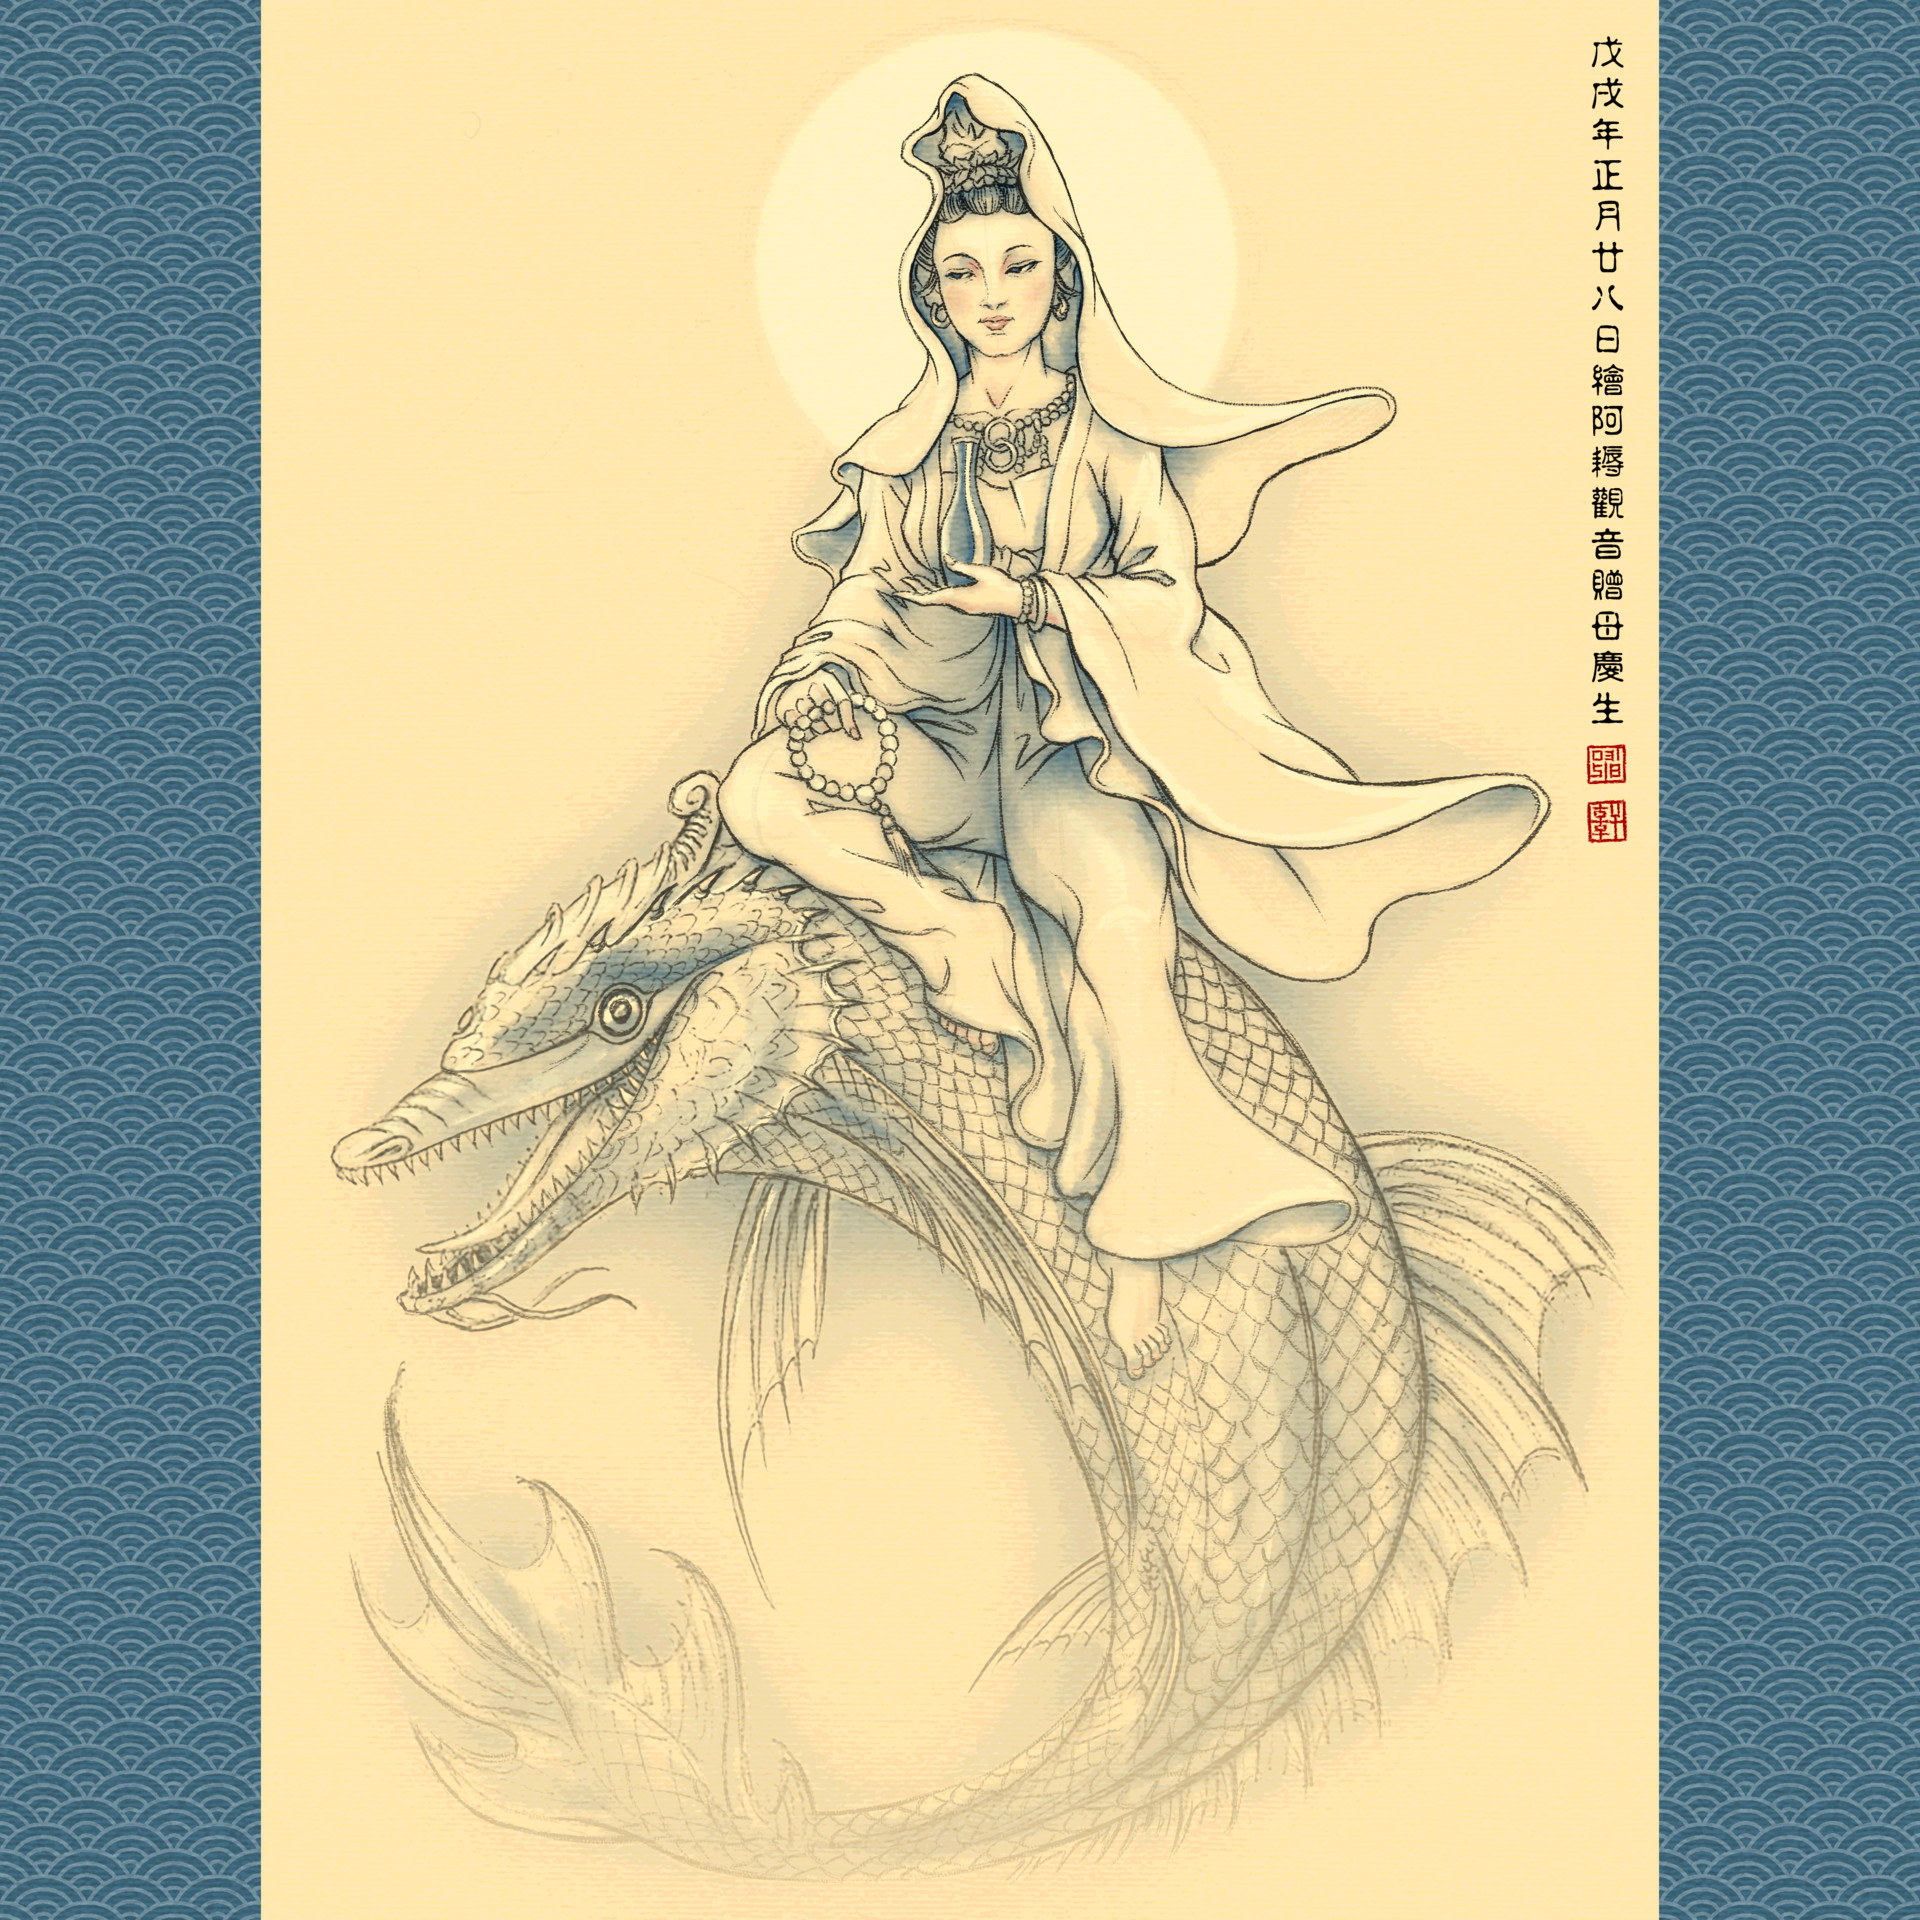 E lynx lin fishridingbodhisattva01